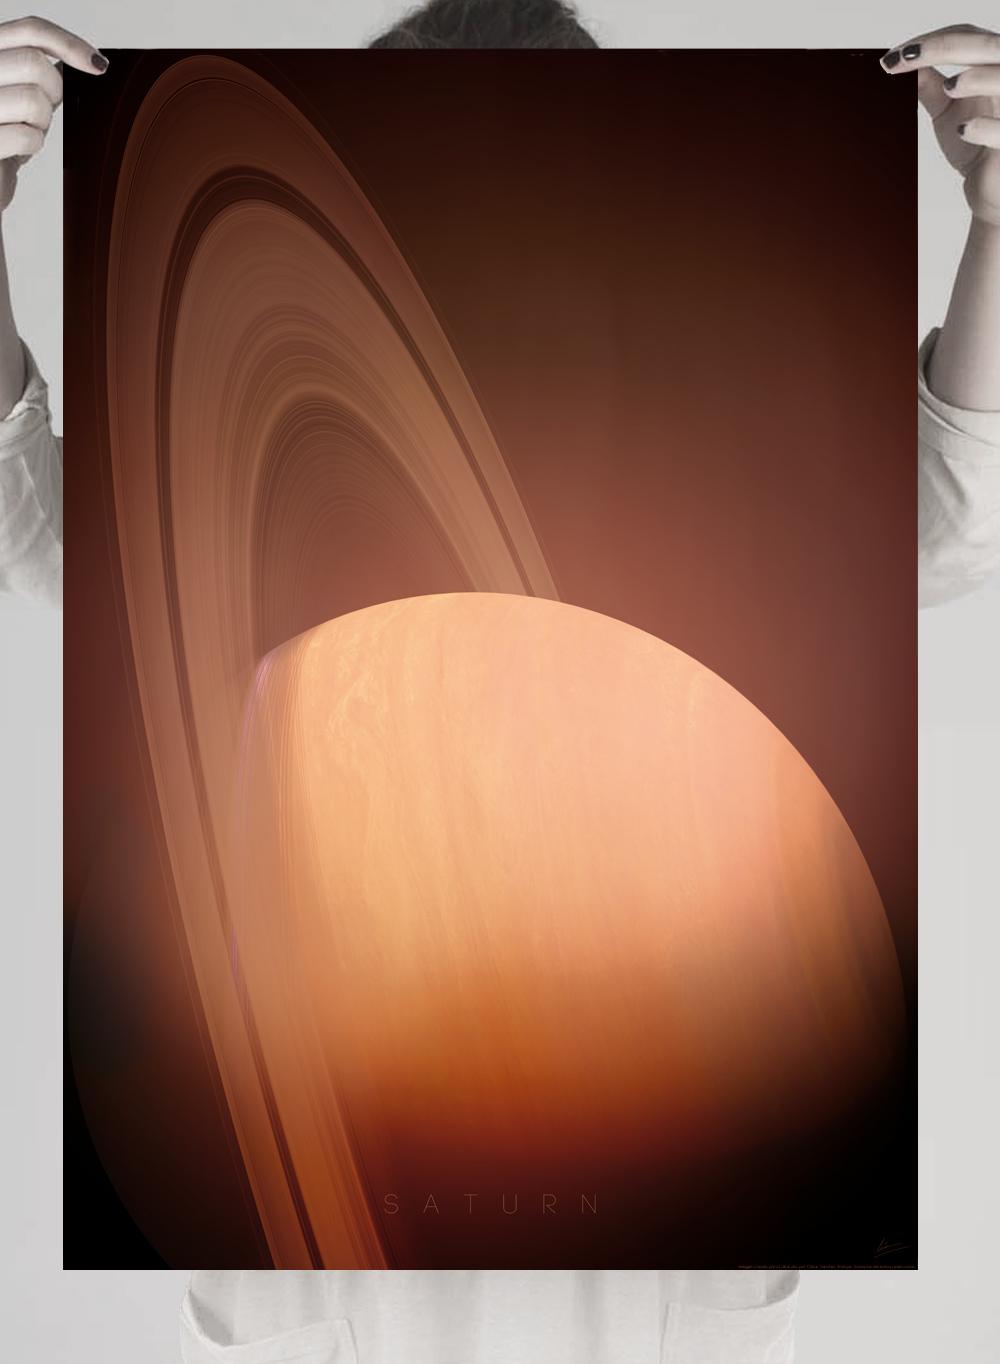 poster planetas saturno